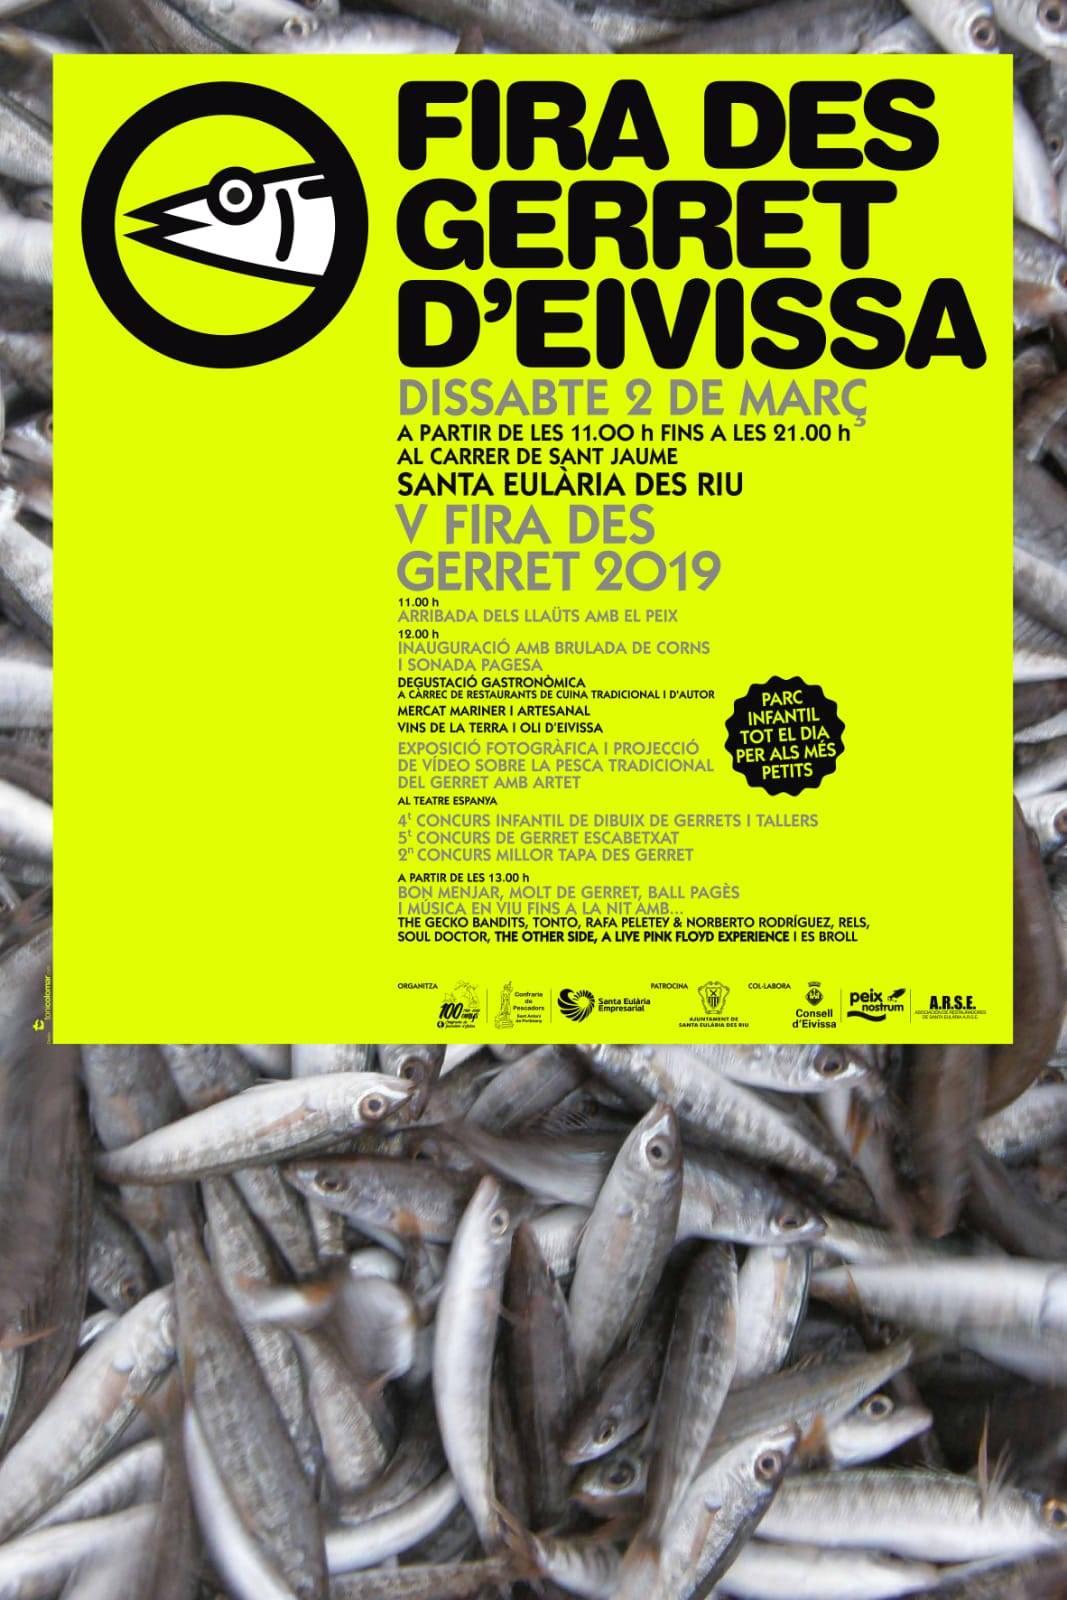 V Fira des Gerret d'Eivissa